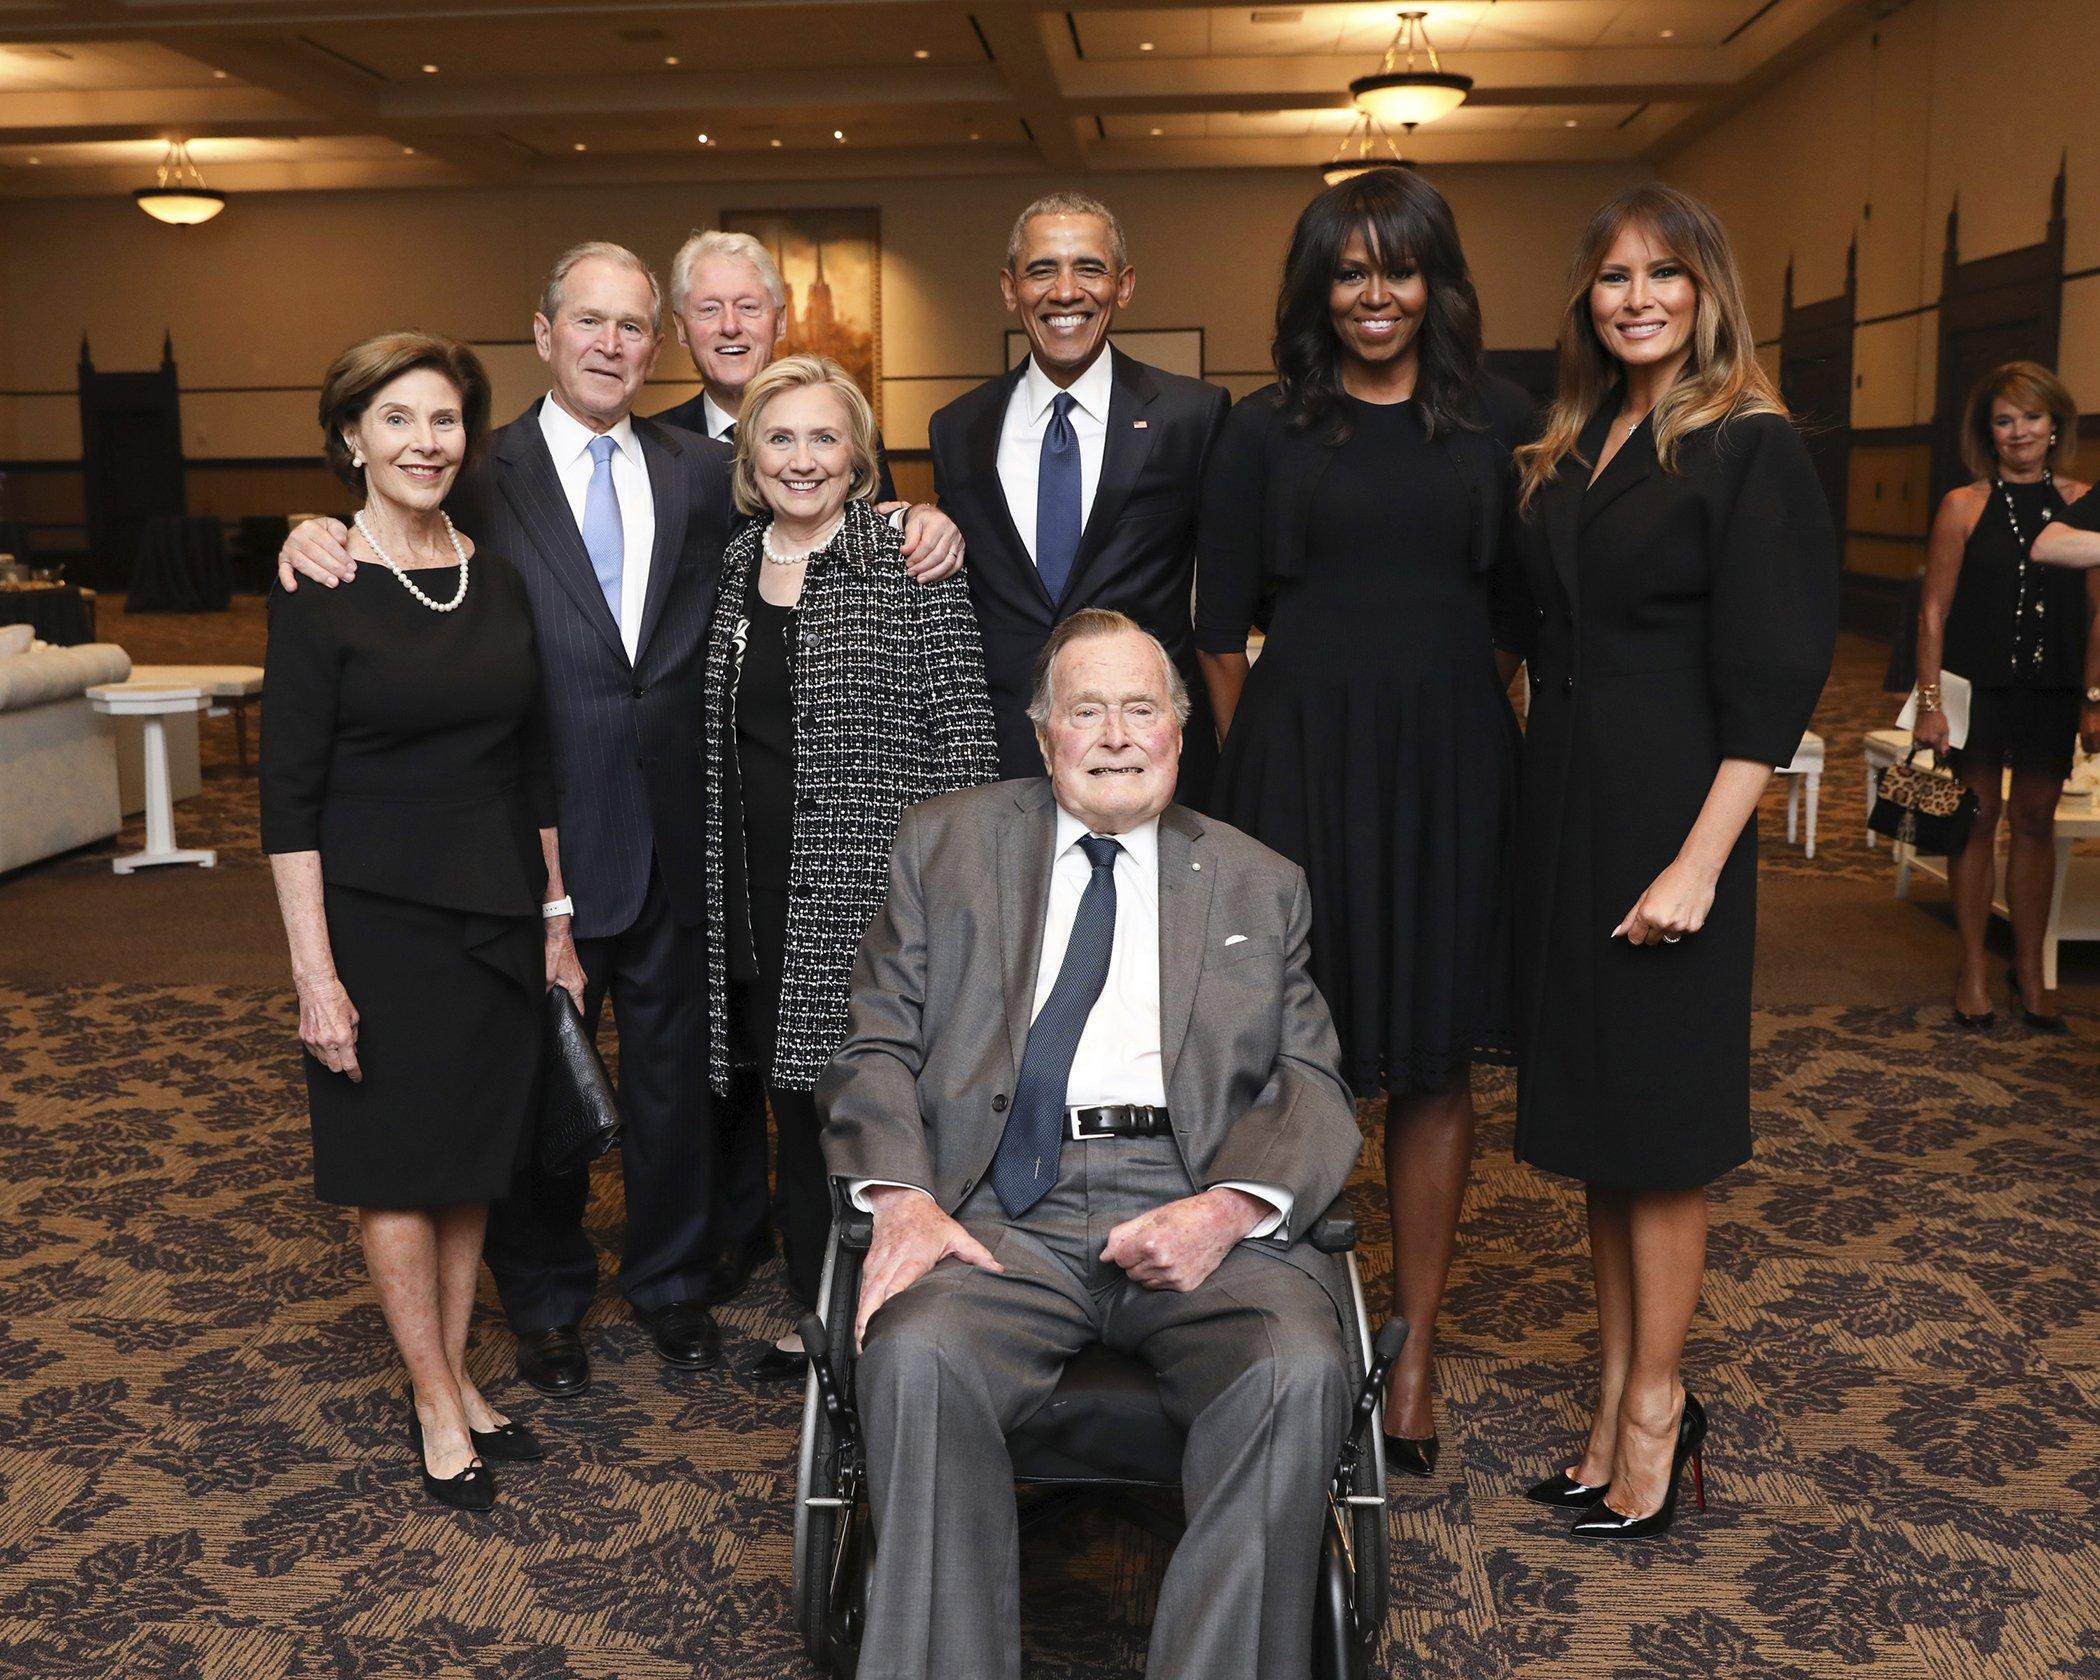 Barbara-Bush-Funeral-Presidents.jpg